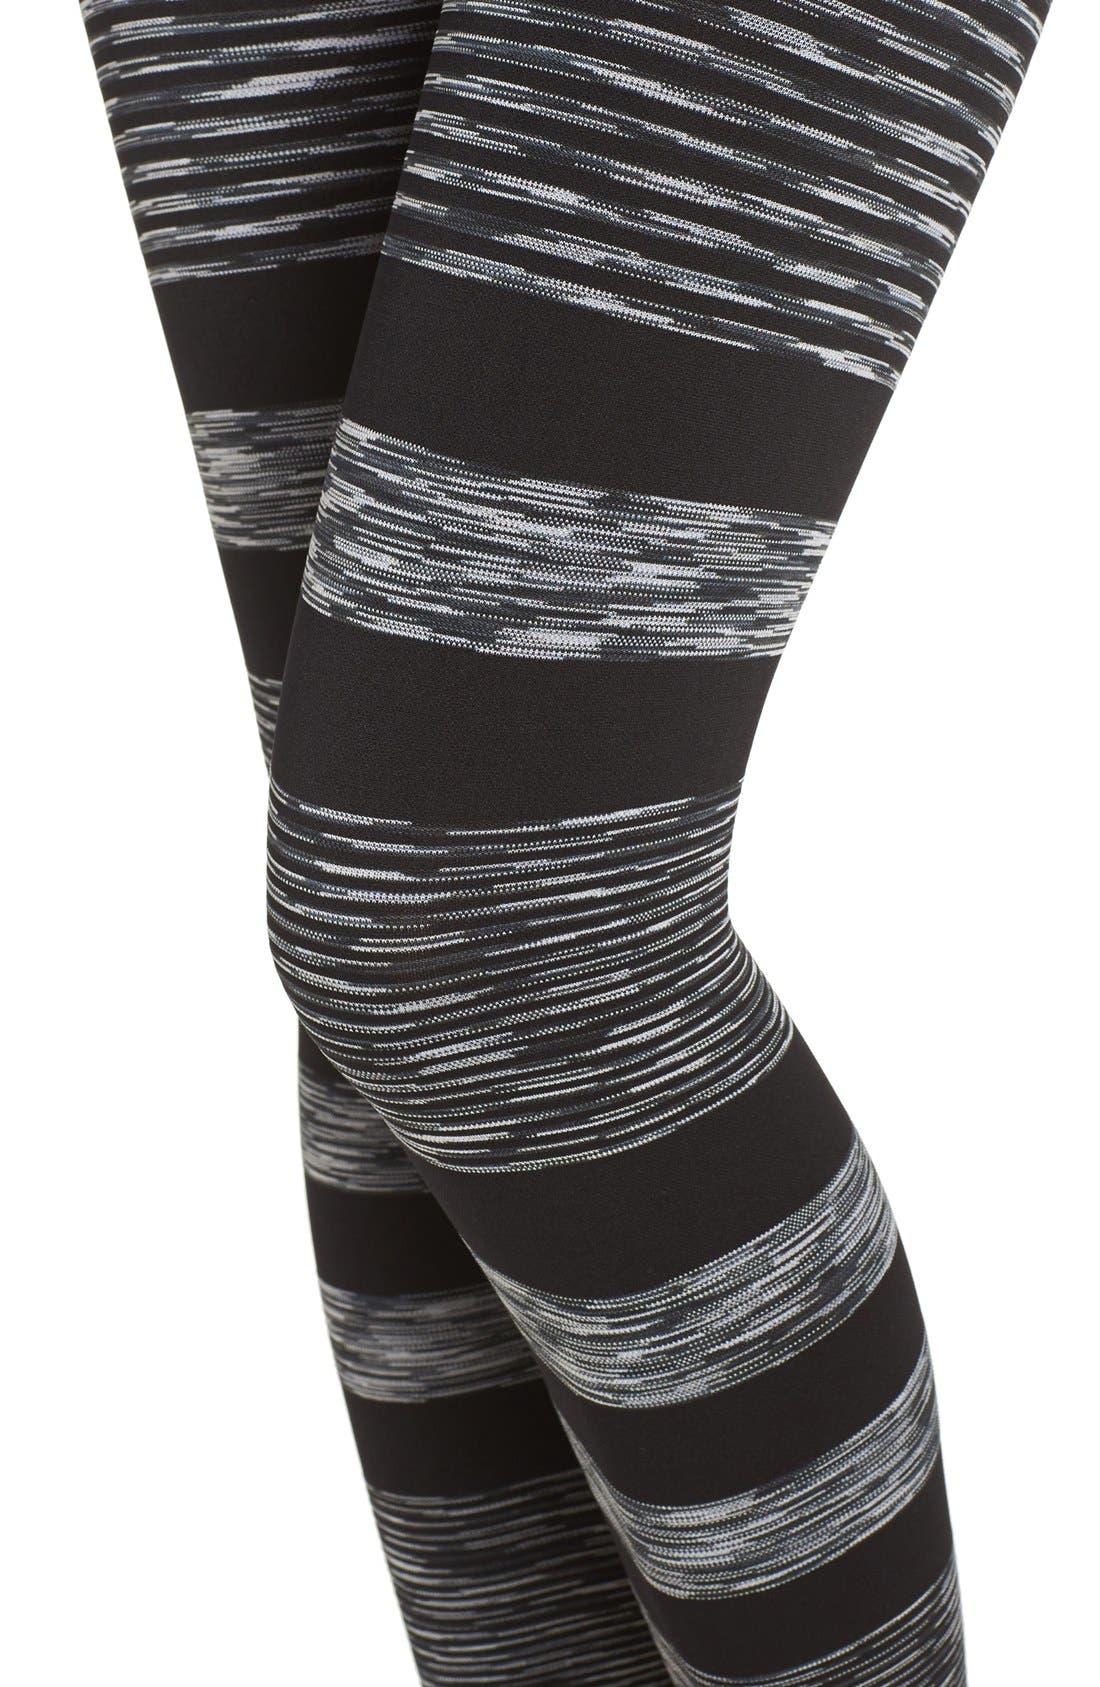 CLIMAWEAR 'Raise the Bar' High Waist Seamless Leggings, Main, color, 001